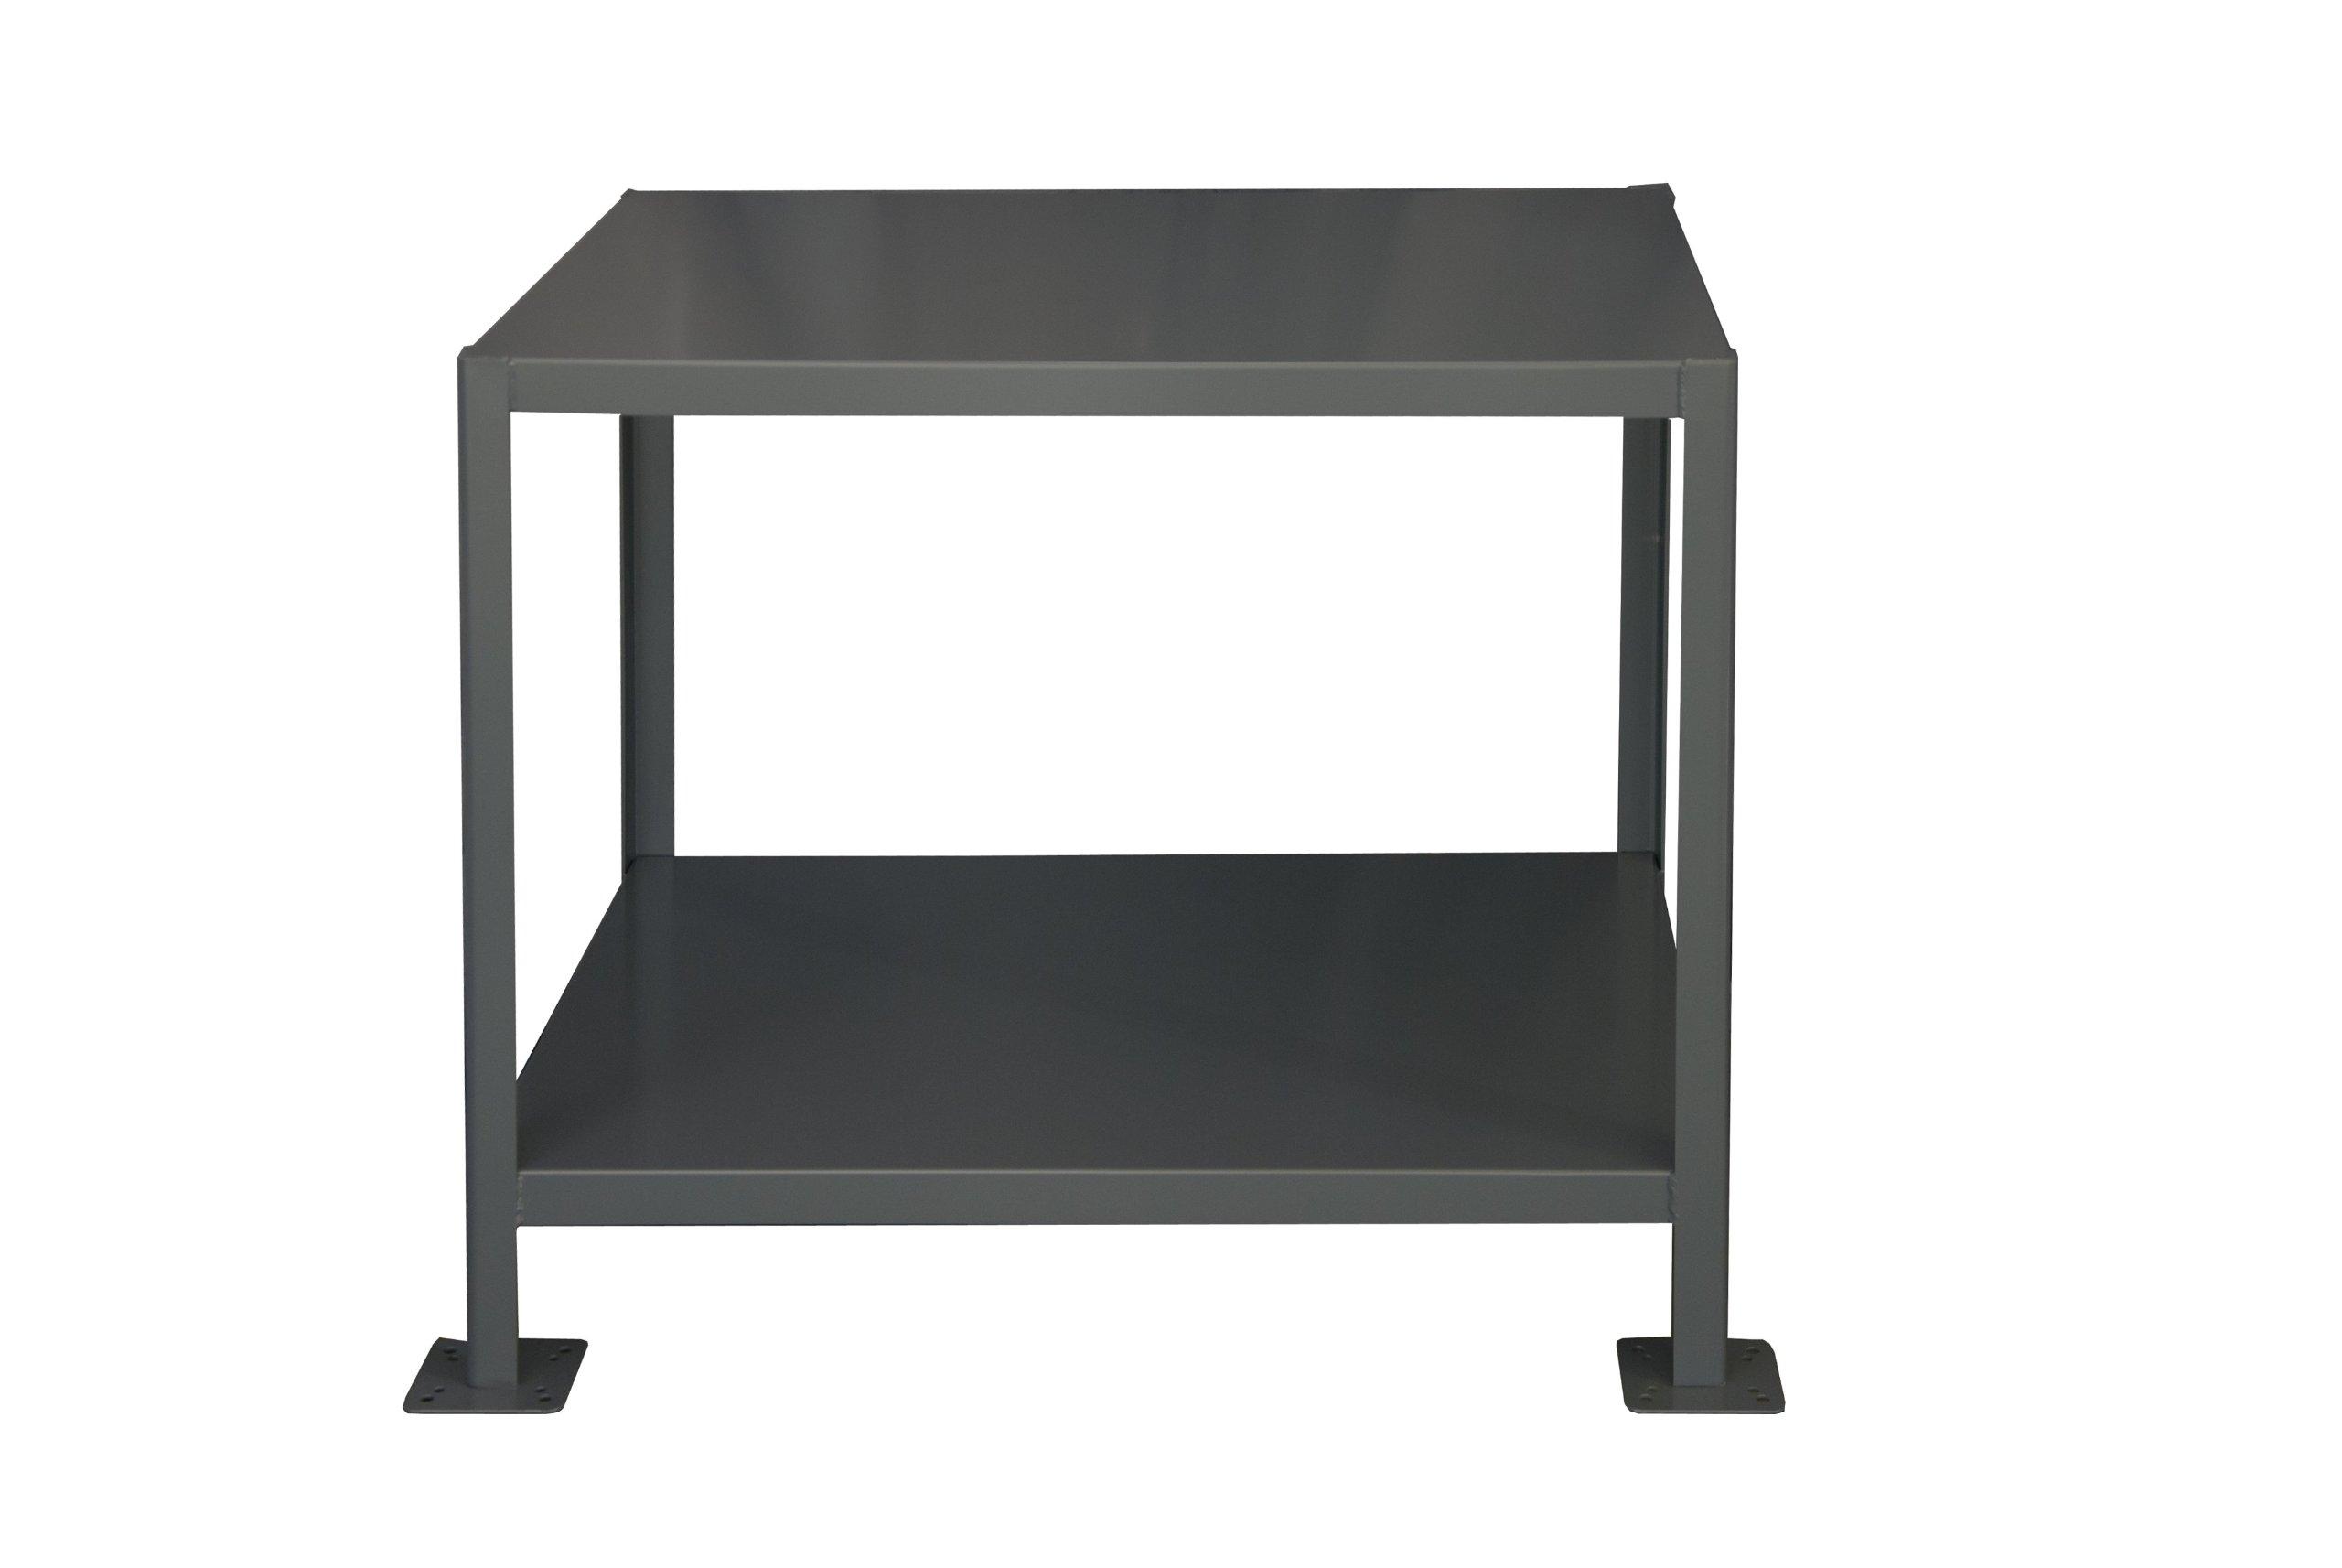 Durham Steel Medium Duty Machine Table, MT243630-2K295, 2 Shelves, 2000 lbs Capacity, 36'' Length x 24'' Width x 30'' Height